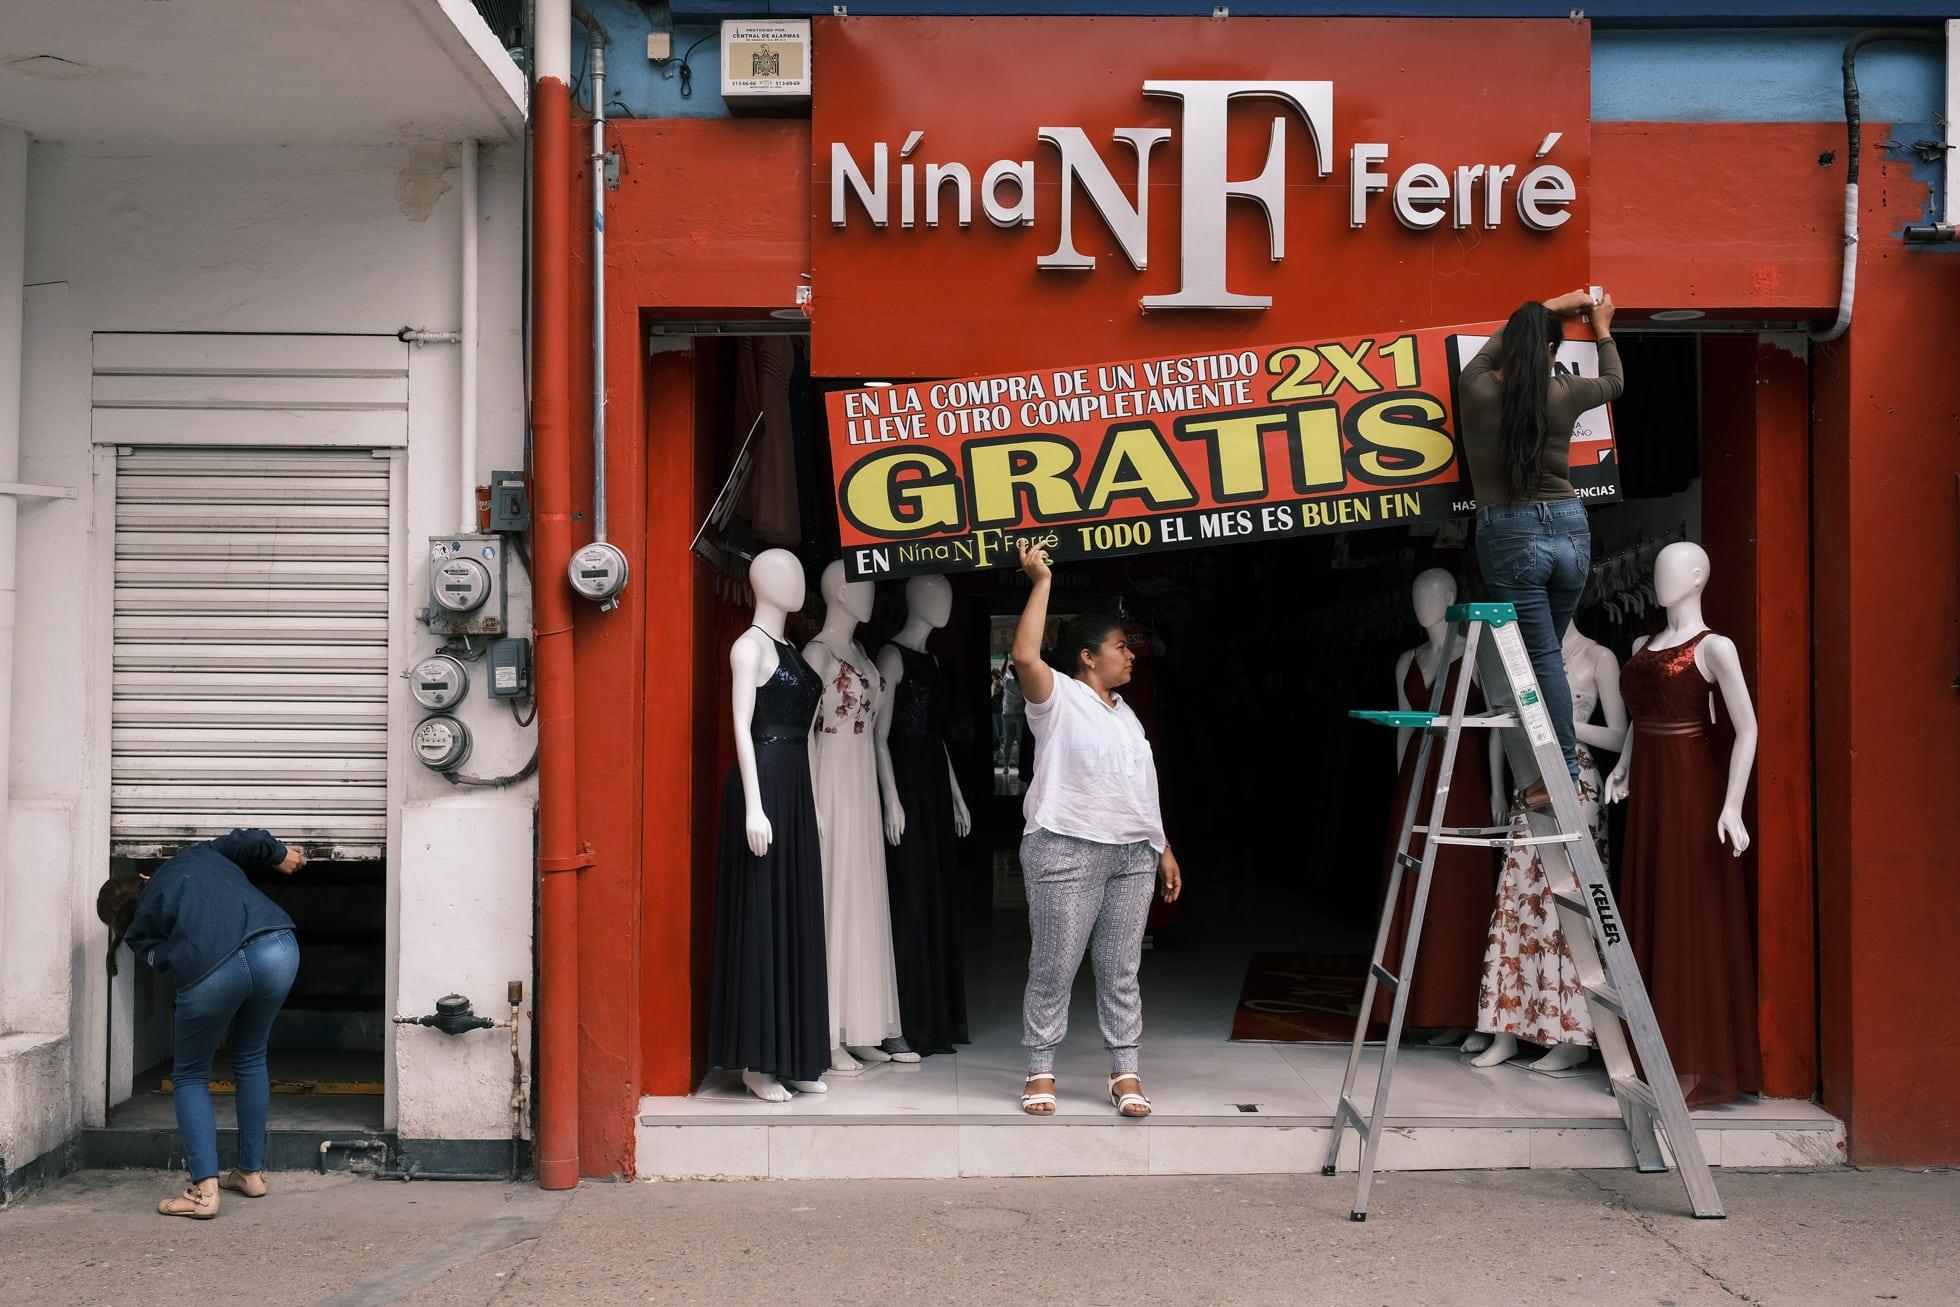 fujifilm-x-pro3-mexico-street-photography-79